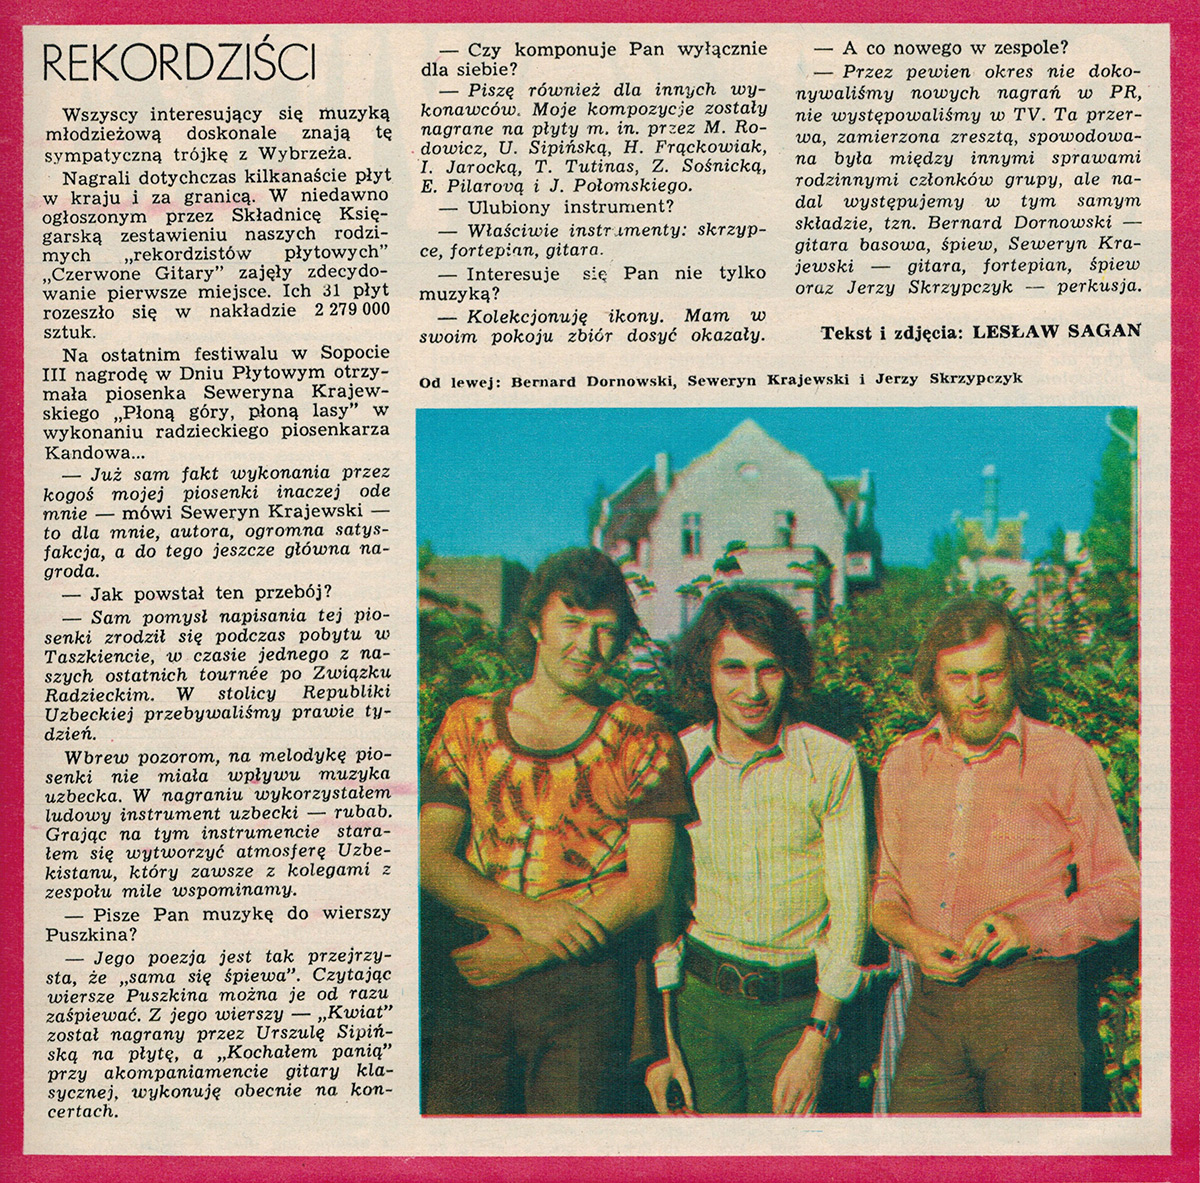 1974_Reportaz